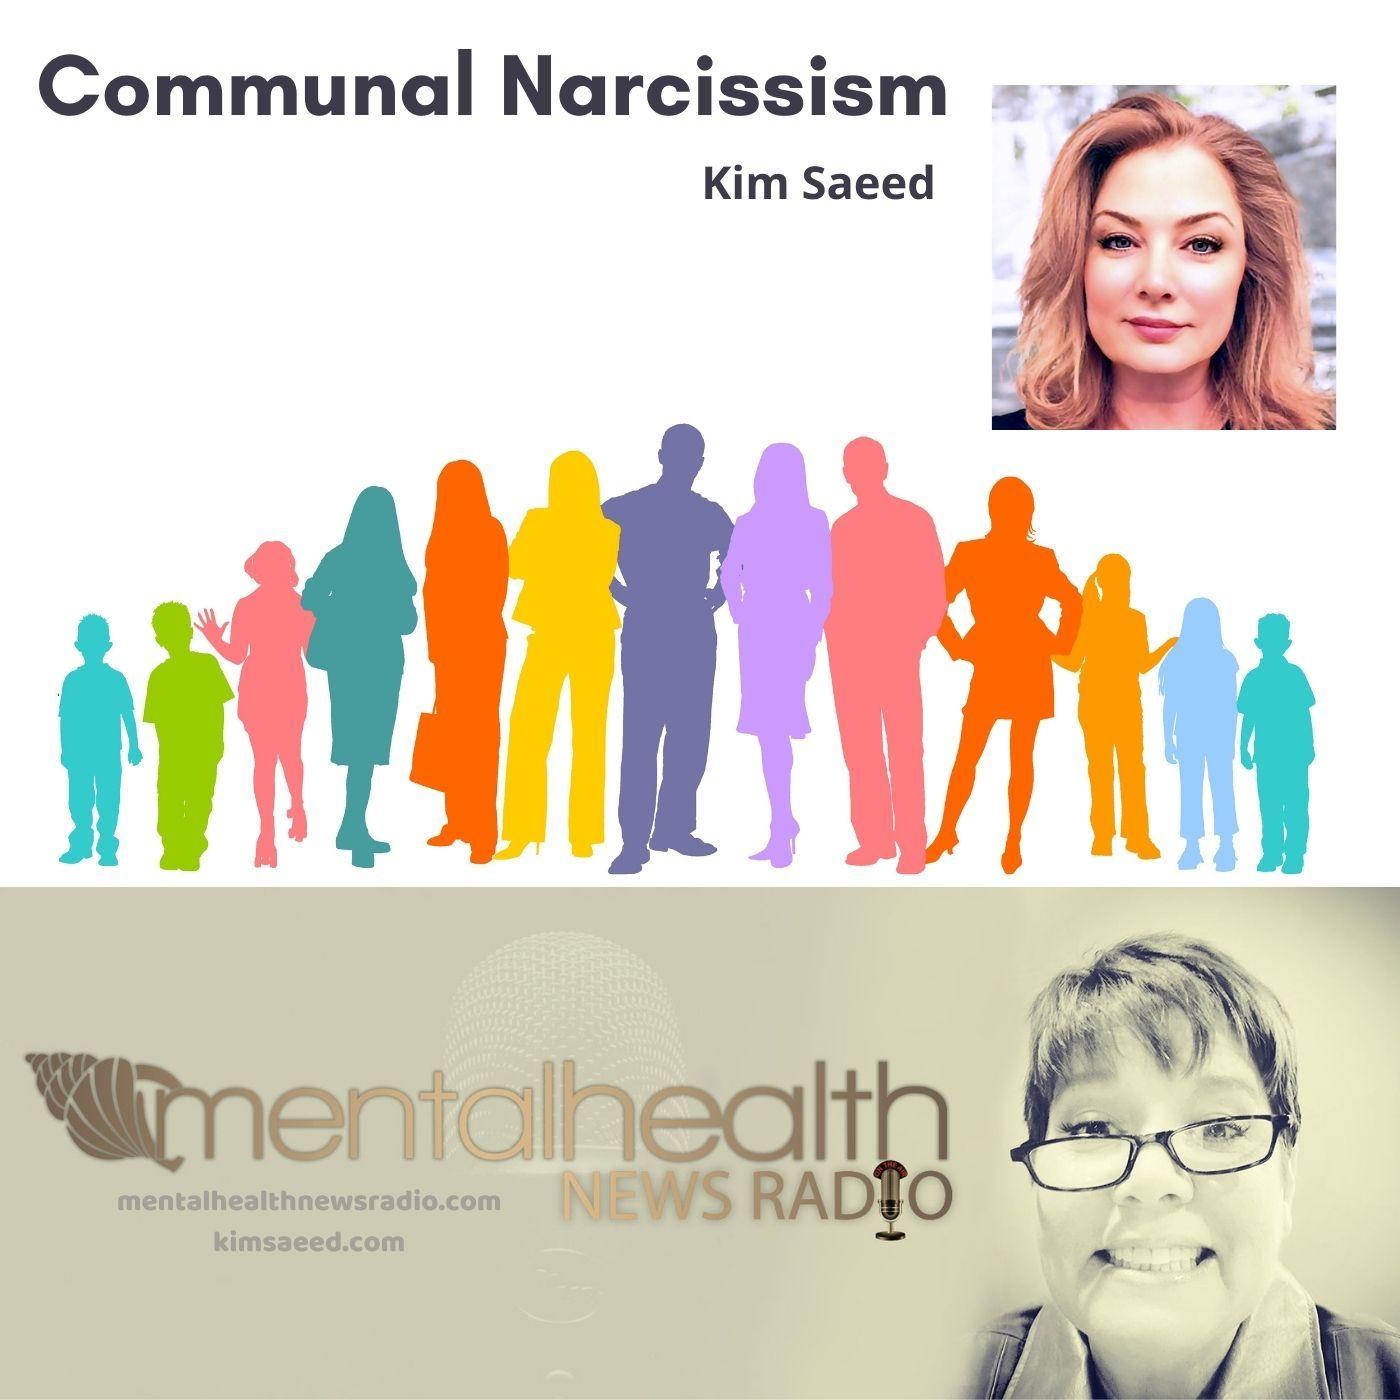 Mental Health News Radio - Communal Narcissism with Kim Saeed